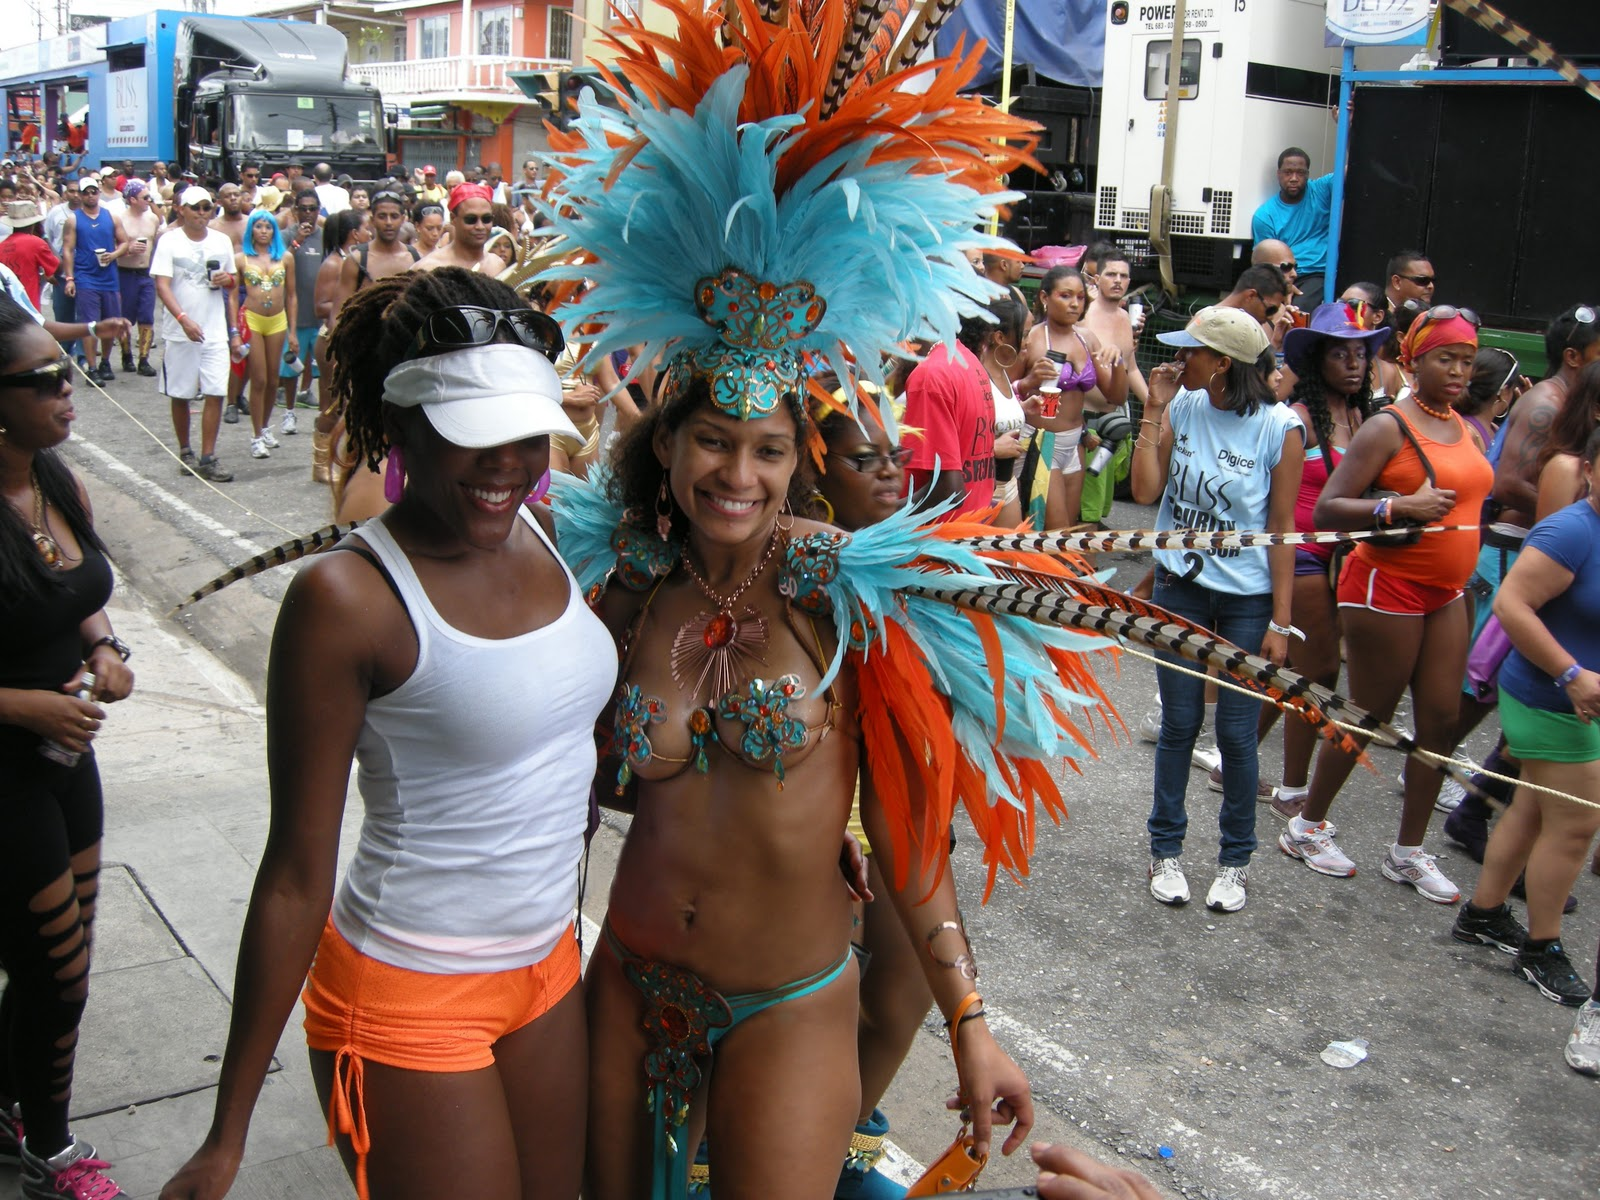 Brazilian Carnival Costumes For Kids  sc 1 st  loadtve & Brazilian Carnival Costumes For Kids 46680 | LOADTVE